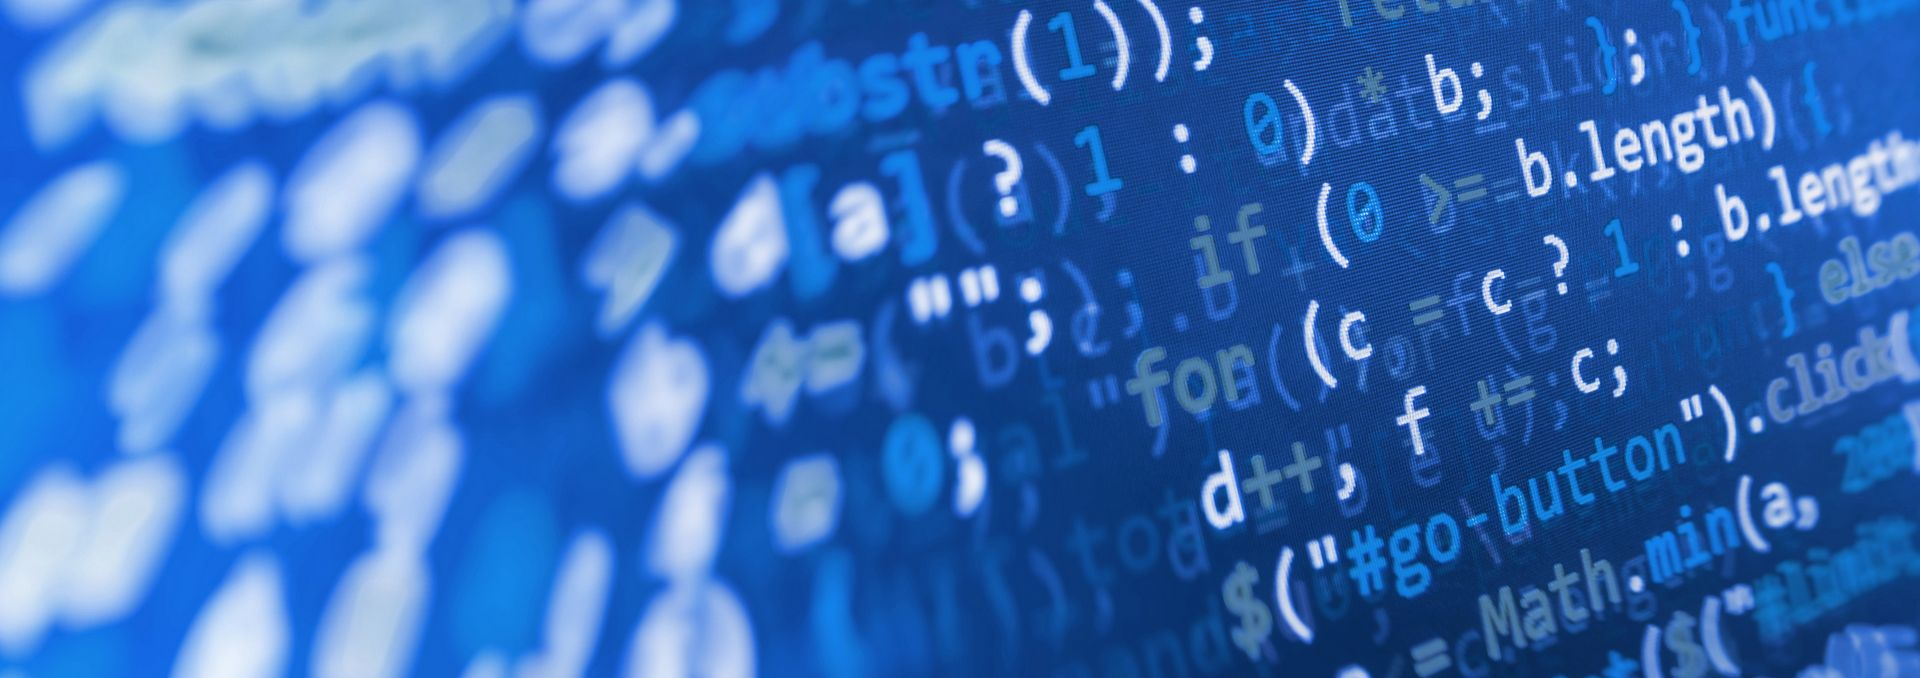 Разработка и верификация программного обеспечения